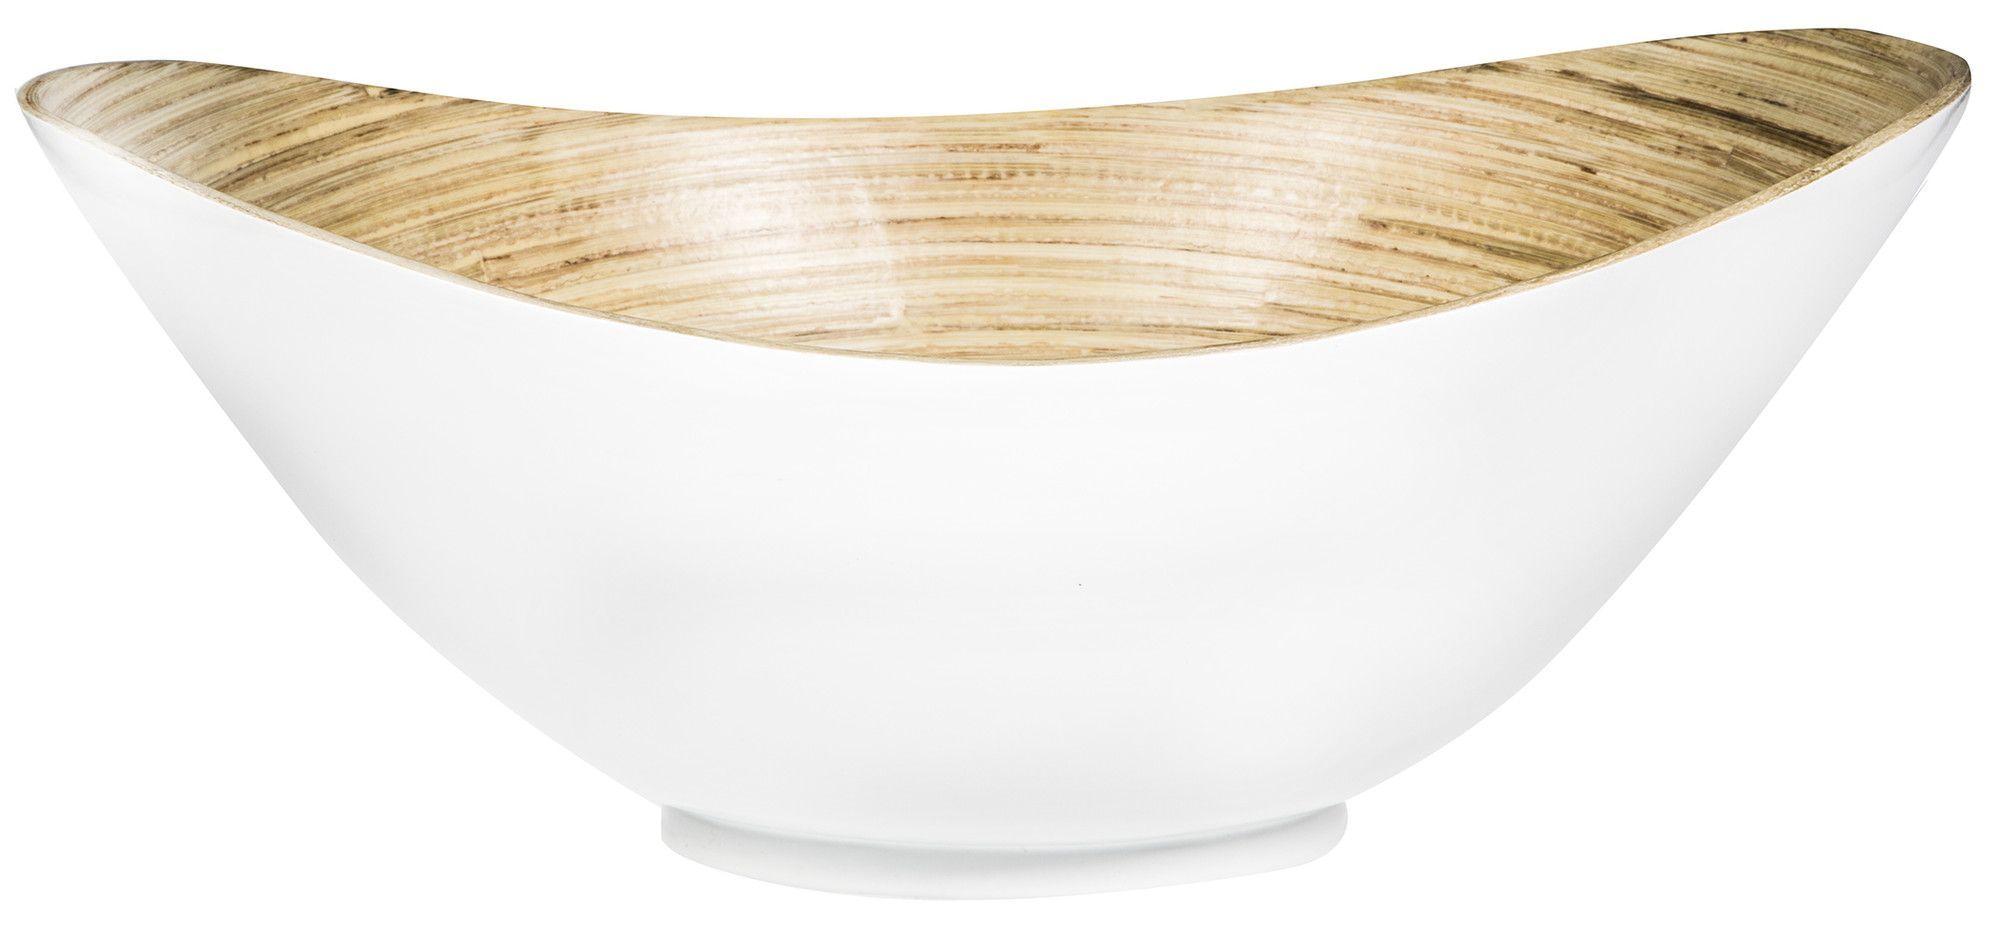 Oval Bamboo Decorative Bowl